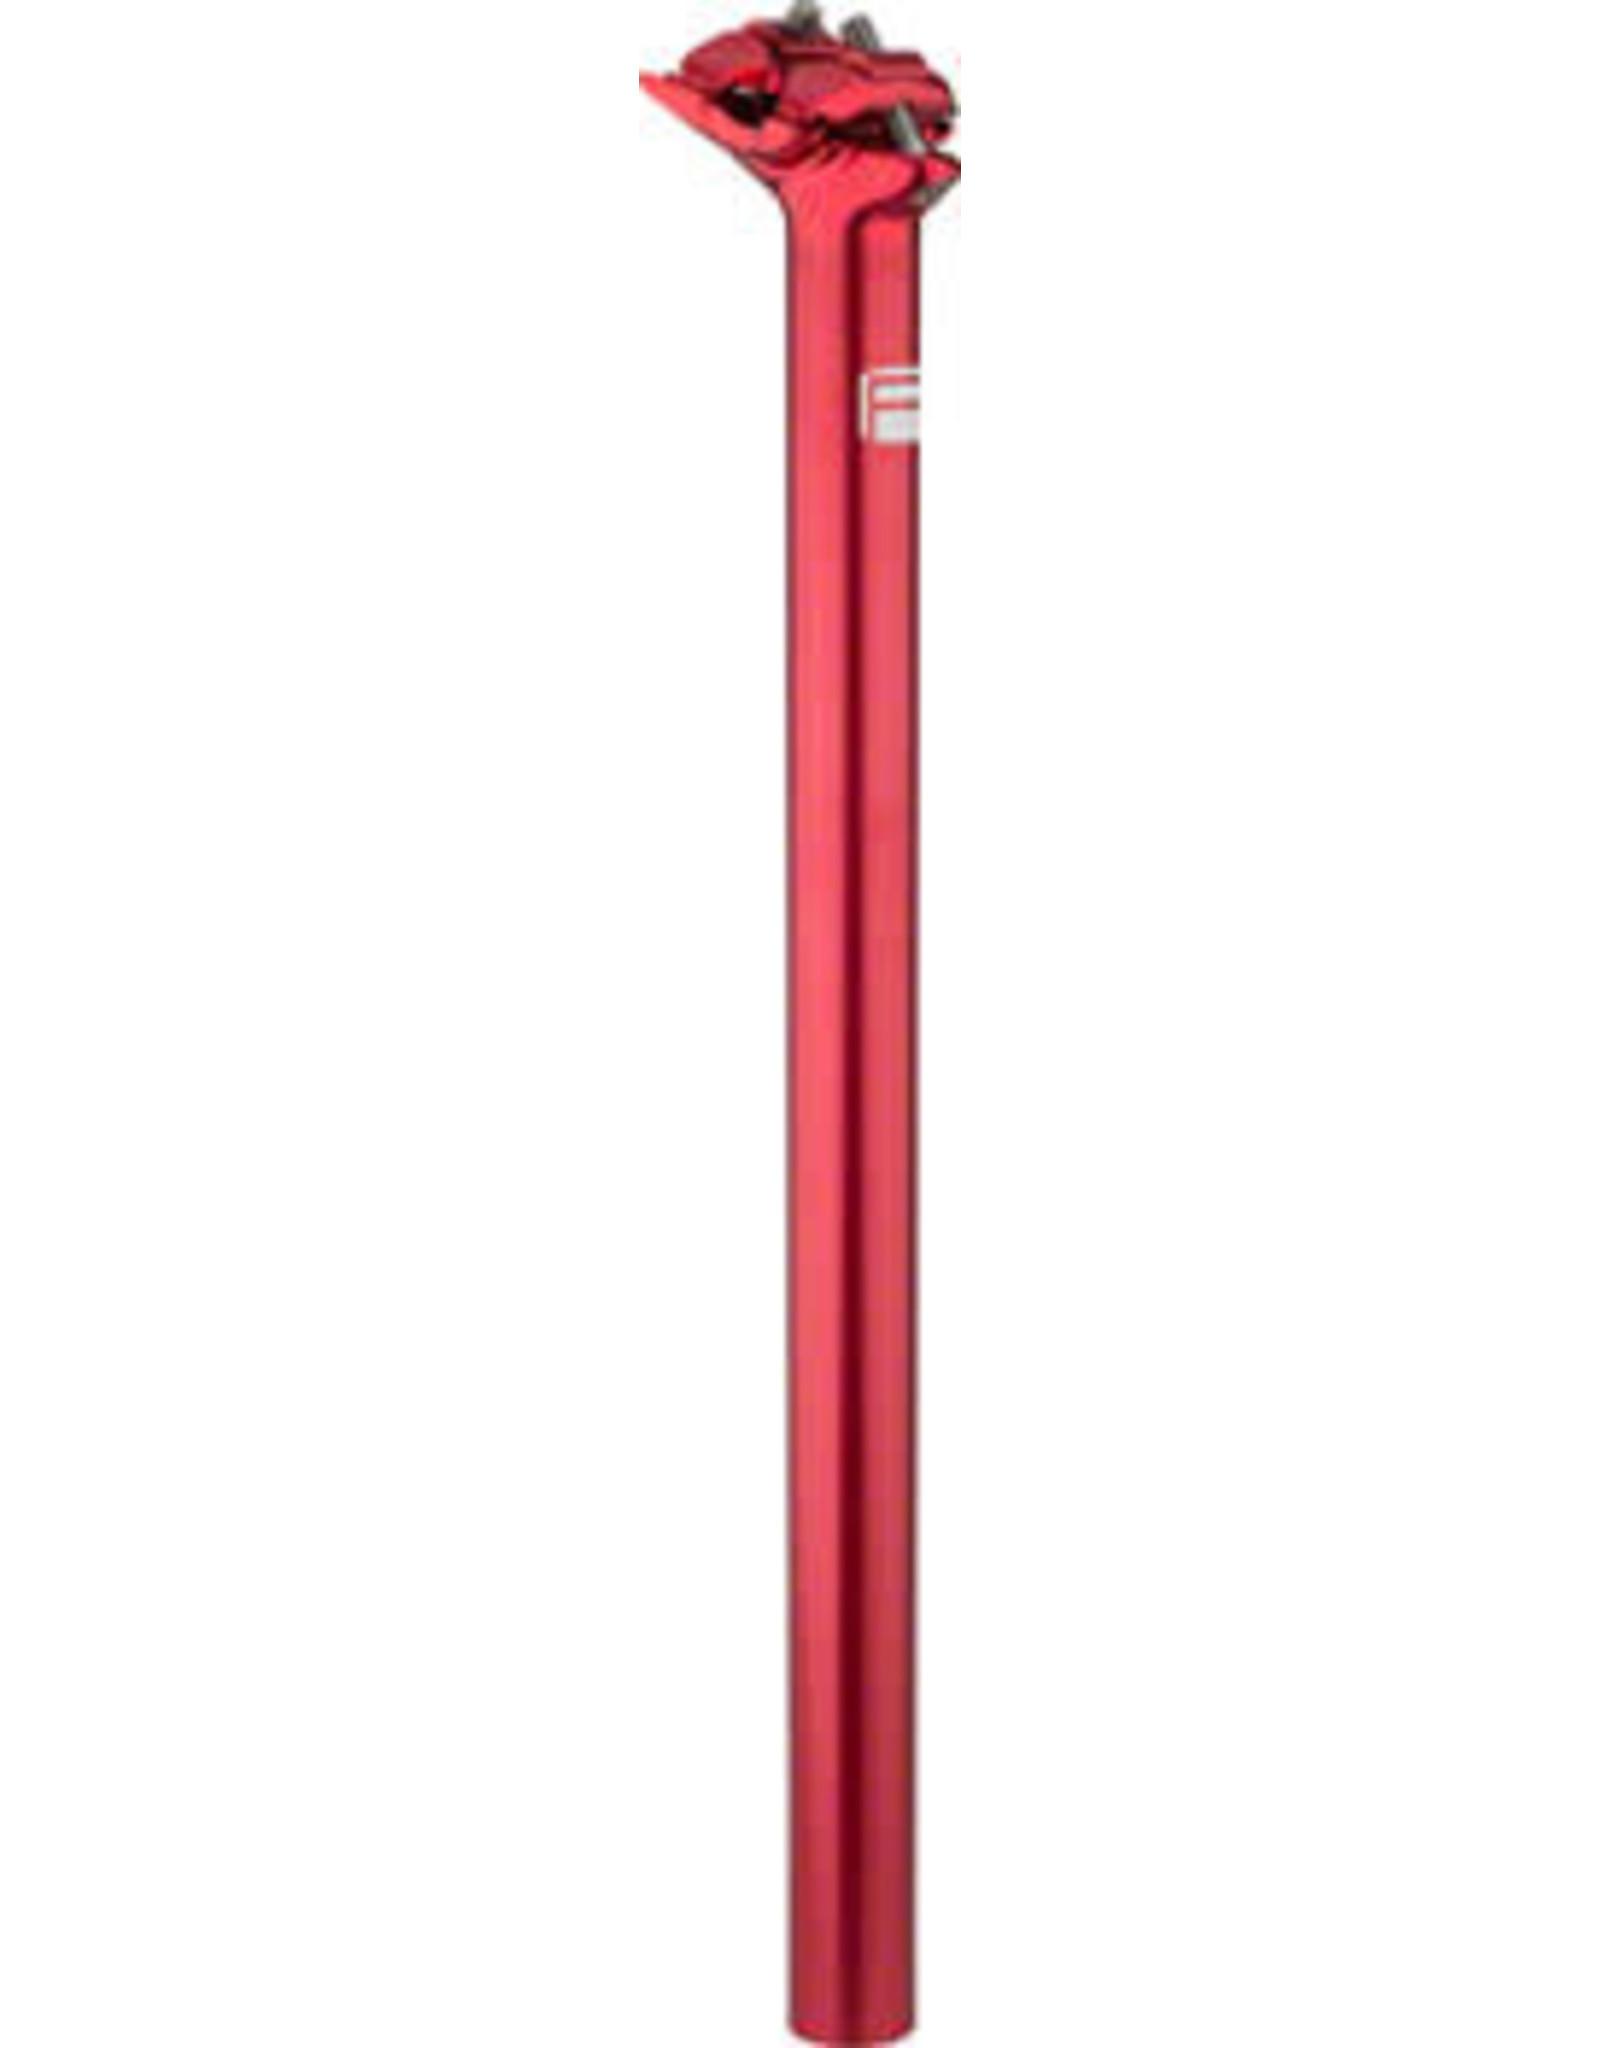 Promax Promax SP-1 Seatpost 27.2 x 400mm Red